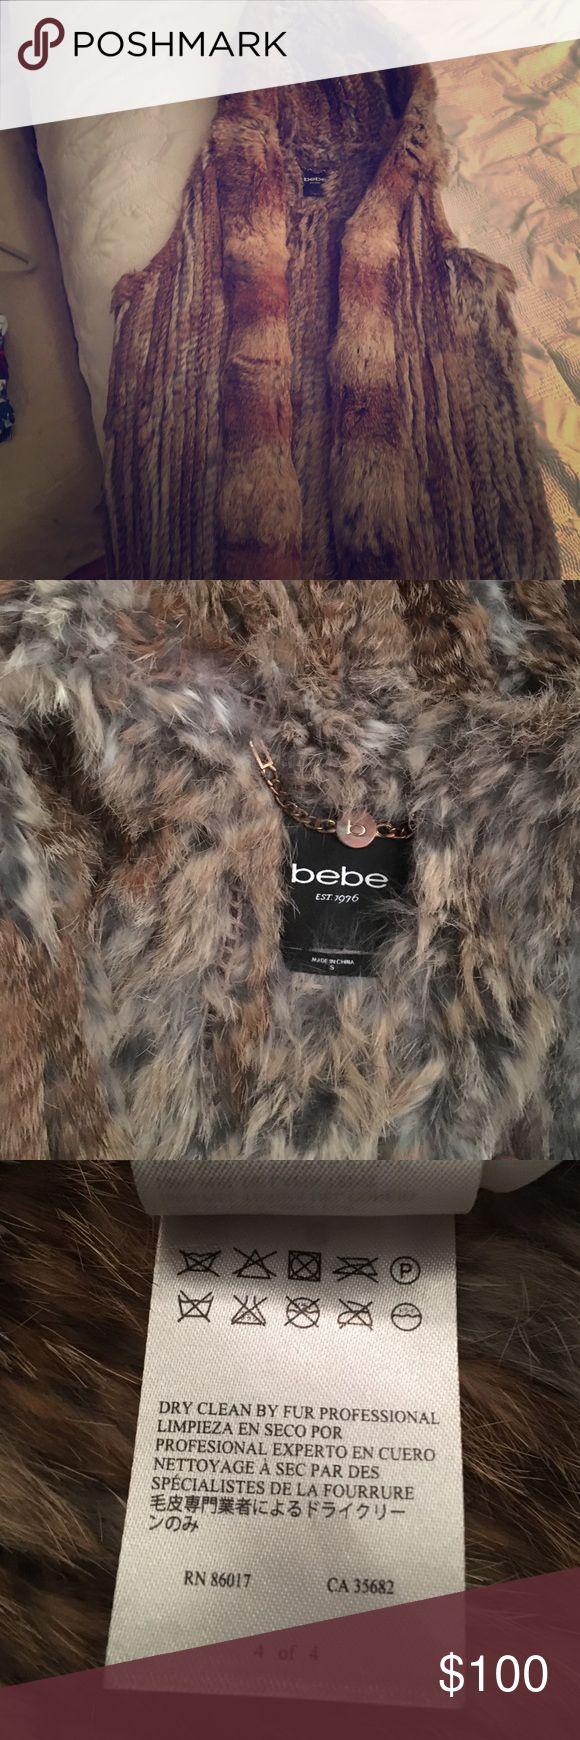 Rabbit fur vest Hip length hooded fur vest. REAL FUR great condition like new. Thin but warm. bebe Jackets & Coats Vests